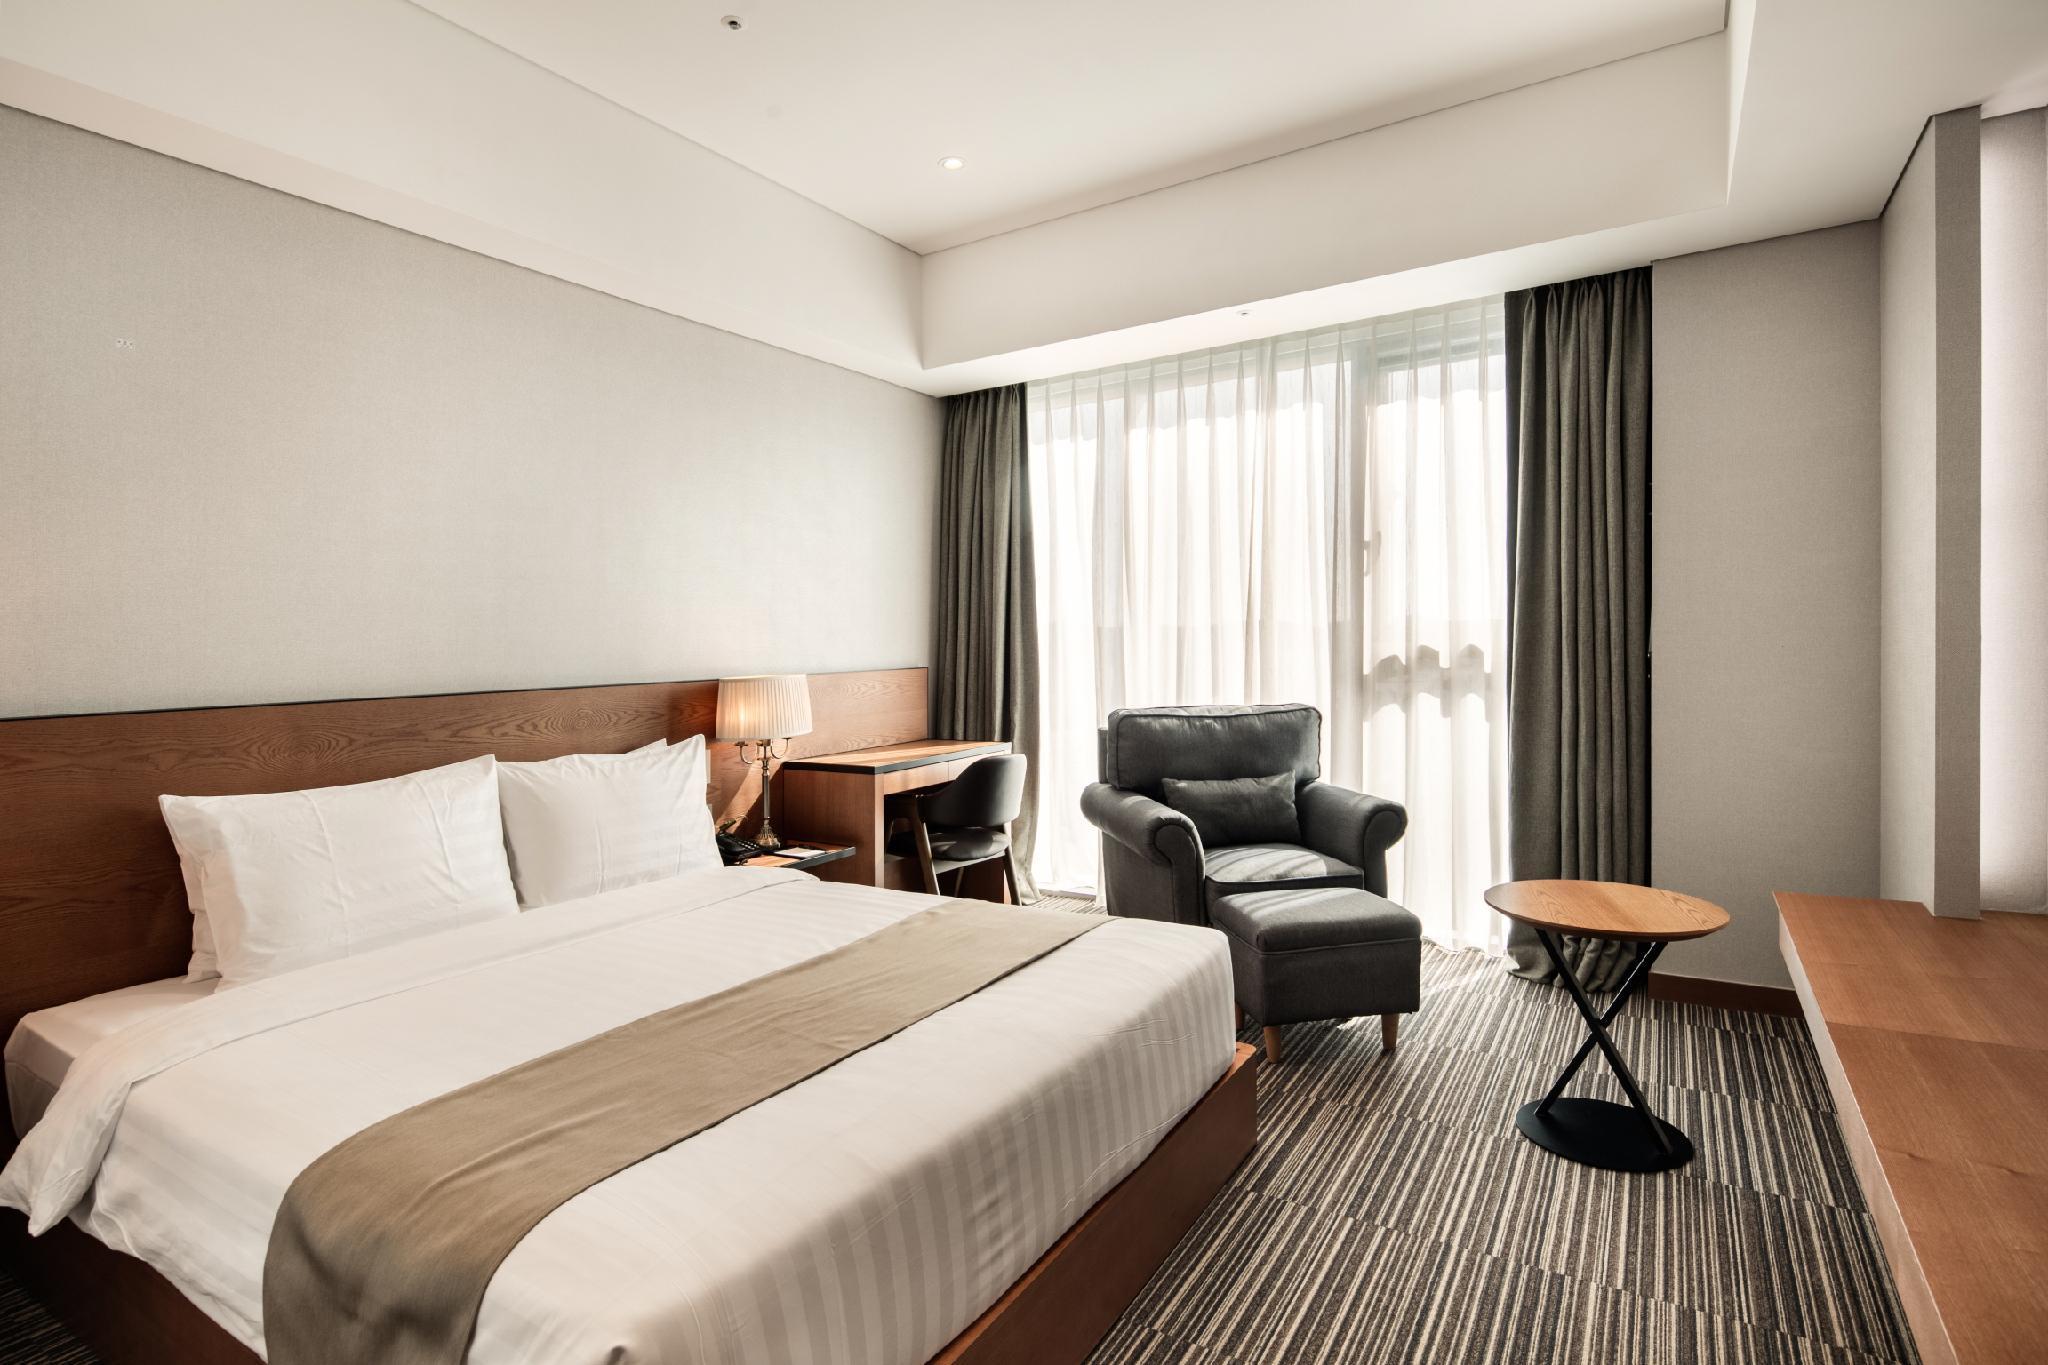 Book Golden Tulip Incheon Airport Hotel South Korea 2019